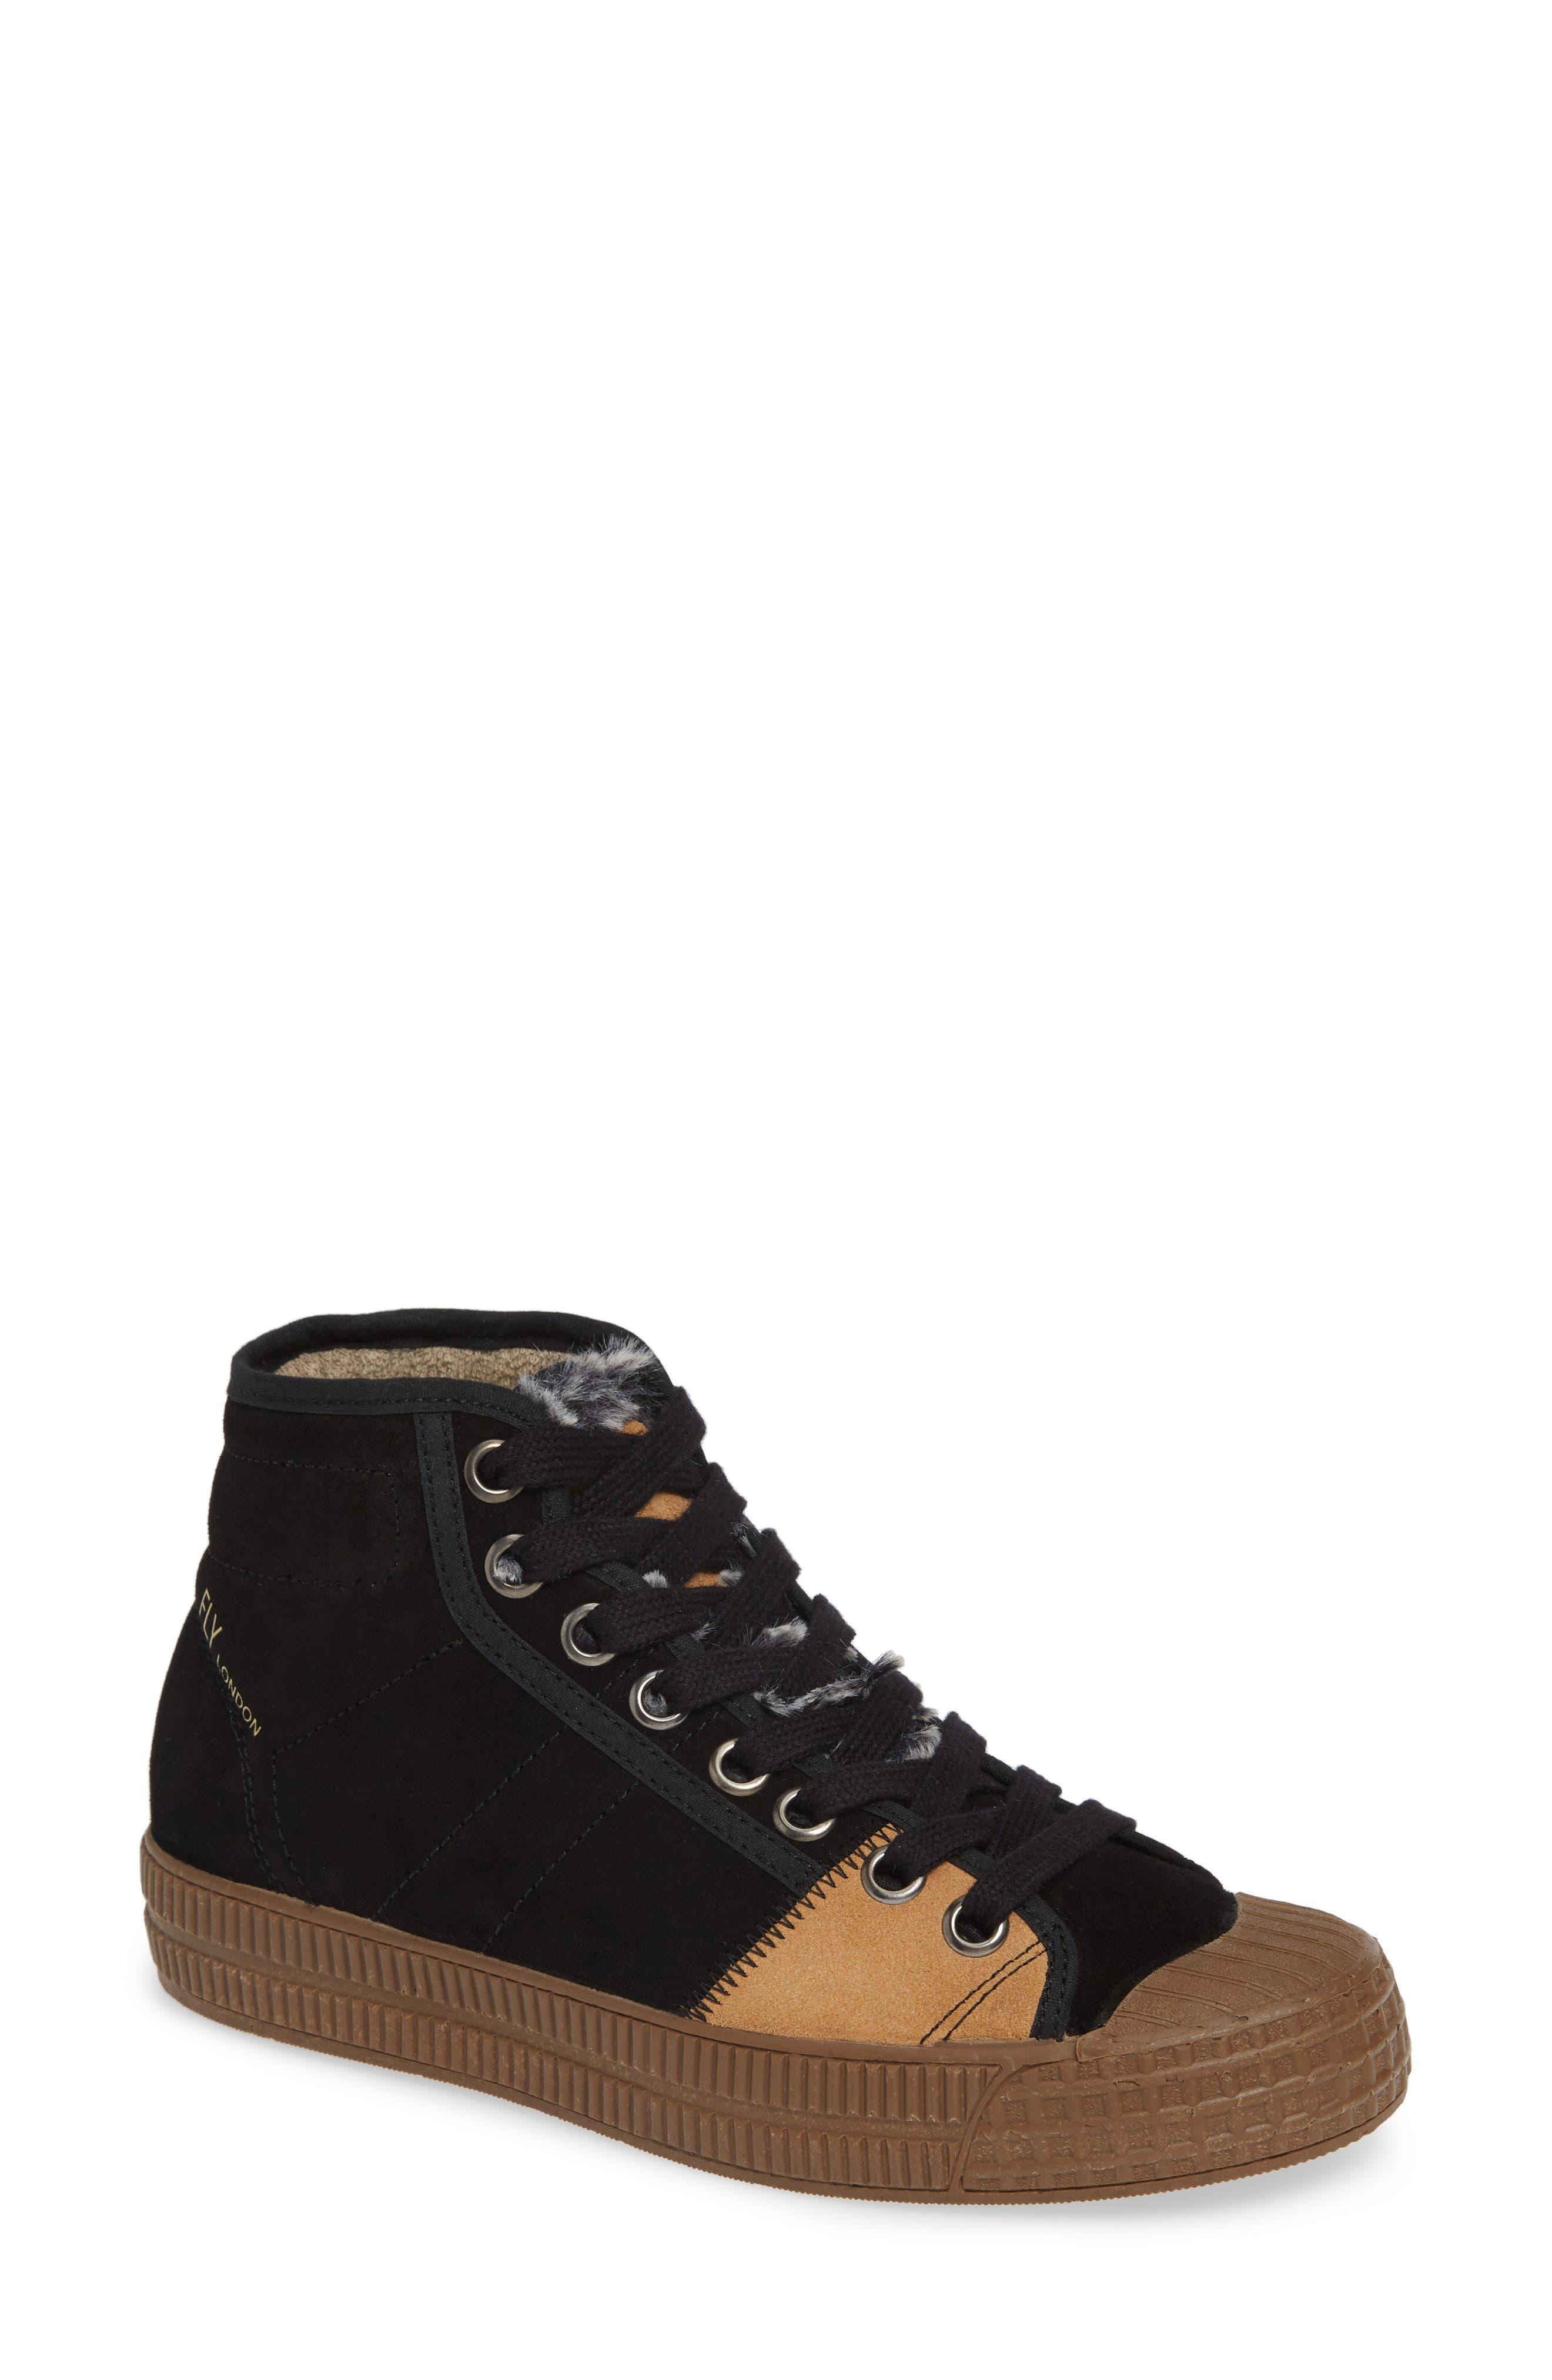 Femp High Top Sneaker,                         Main,                         color, BLACK/ CAMEL SUEDE